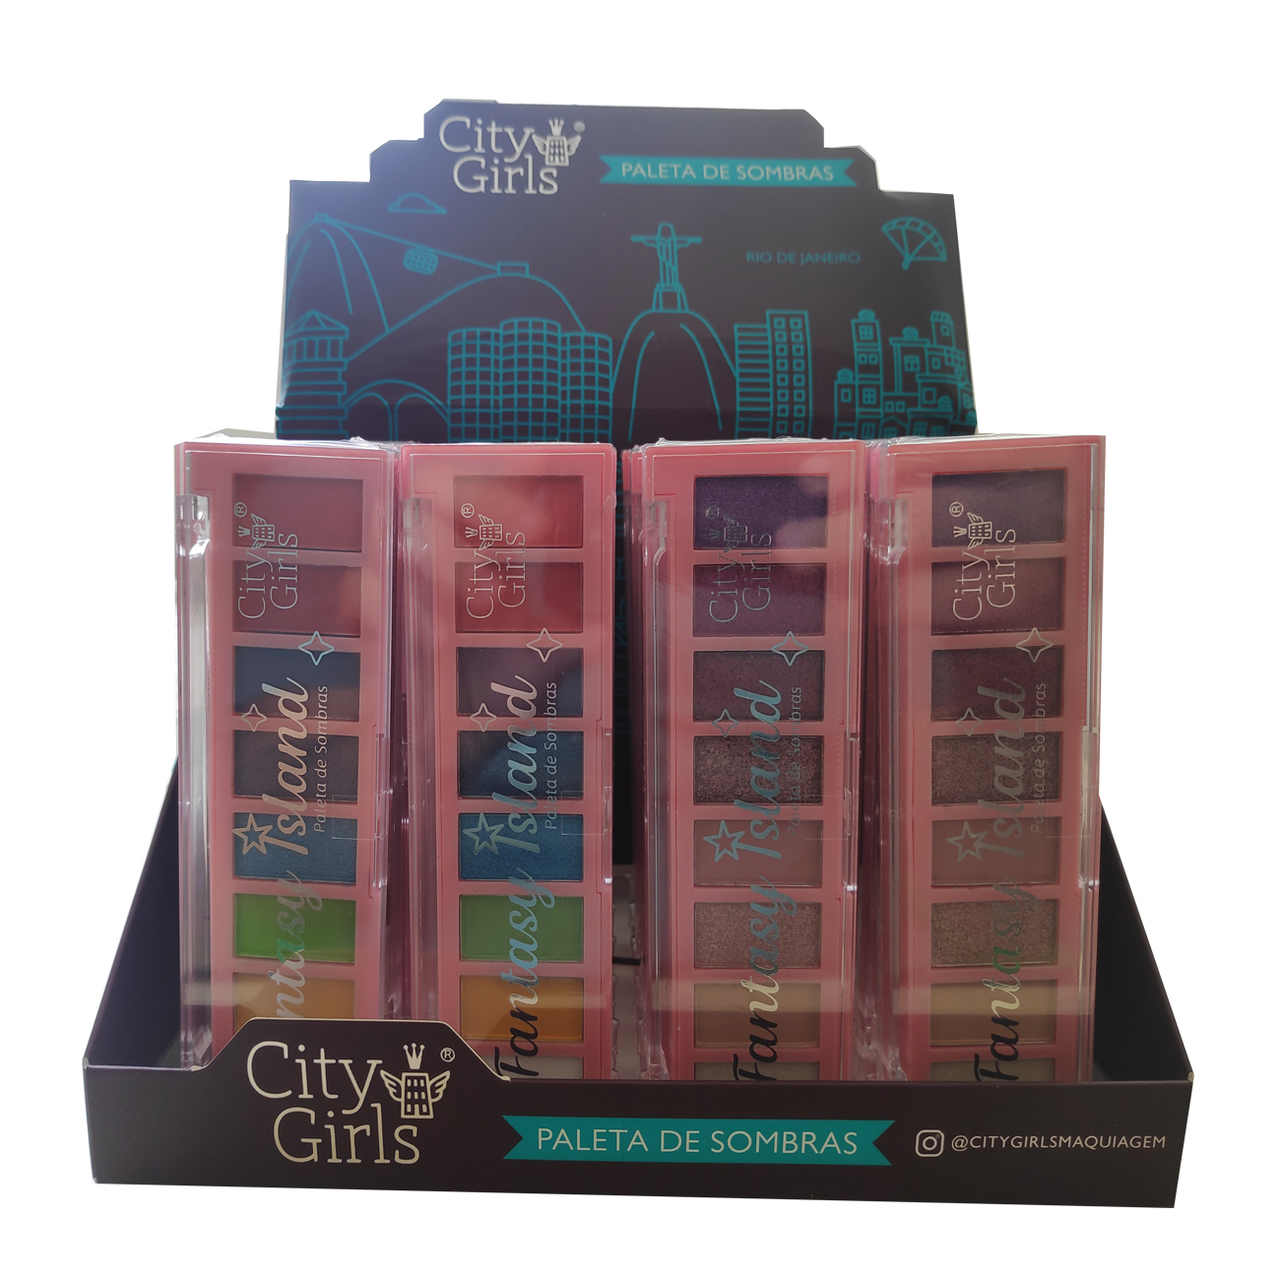 Paleta de Sombras Fantasy Island City Girls - Display com 24 unidades - CG179 Atacado